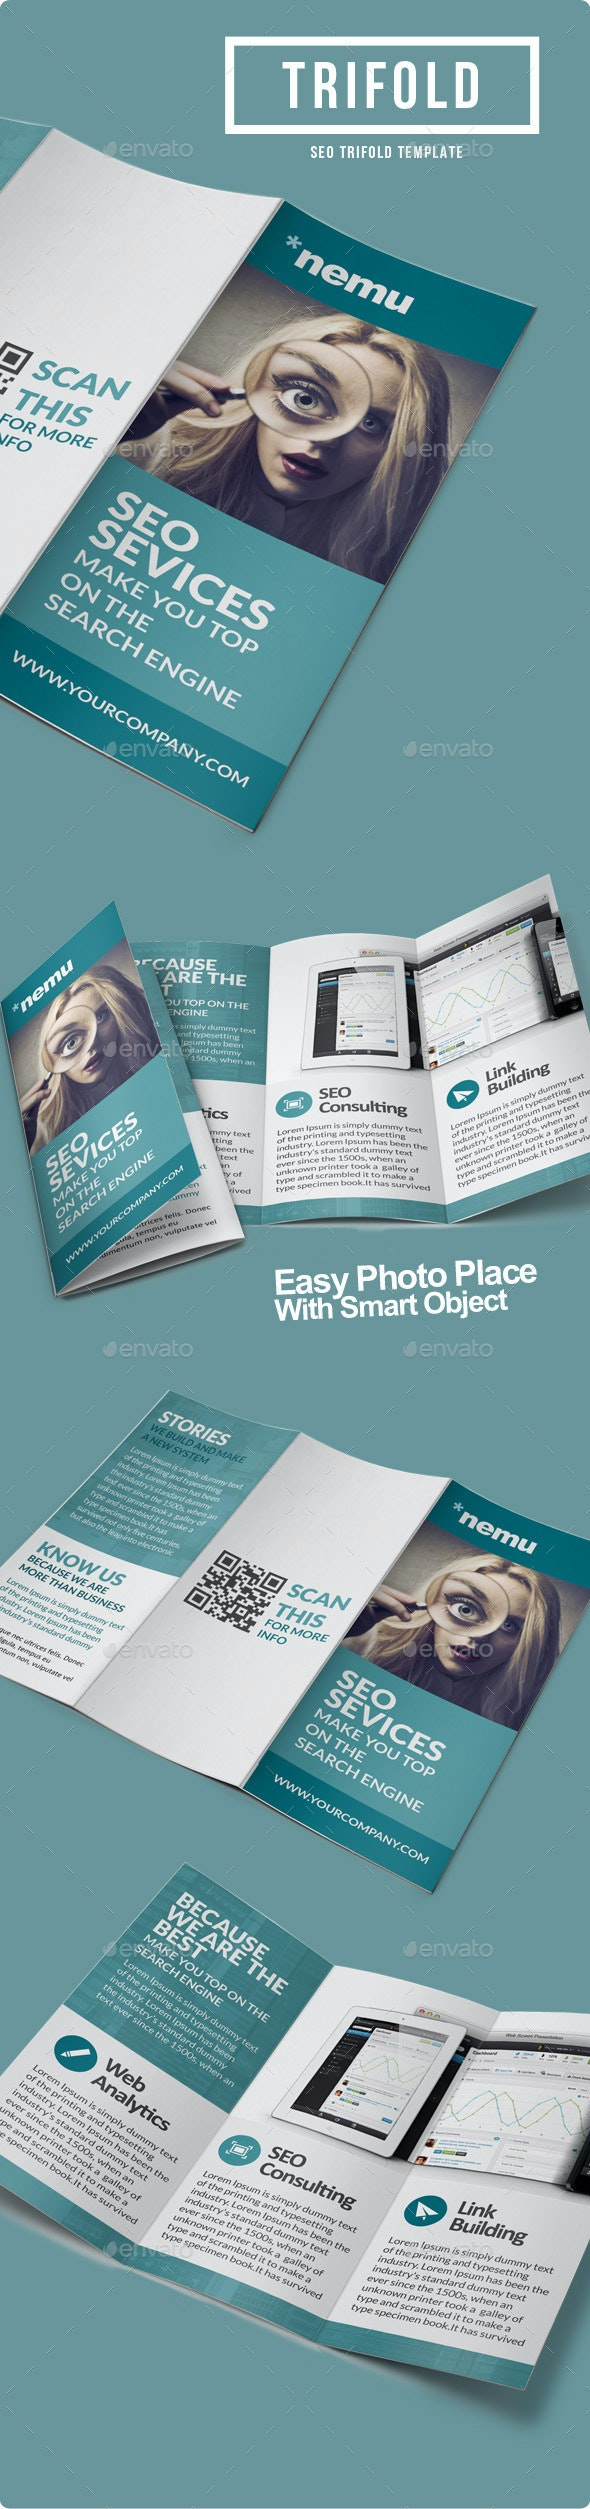 SEO Marketing Trifold Brochure - Informational Brochures